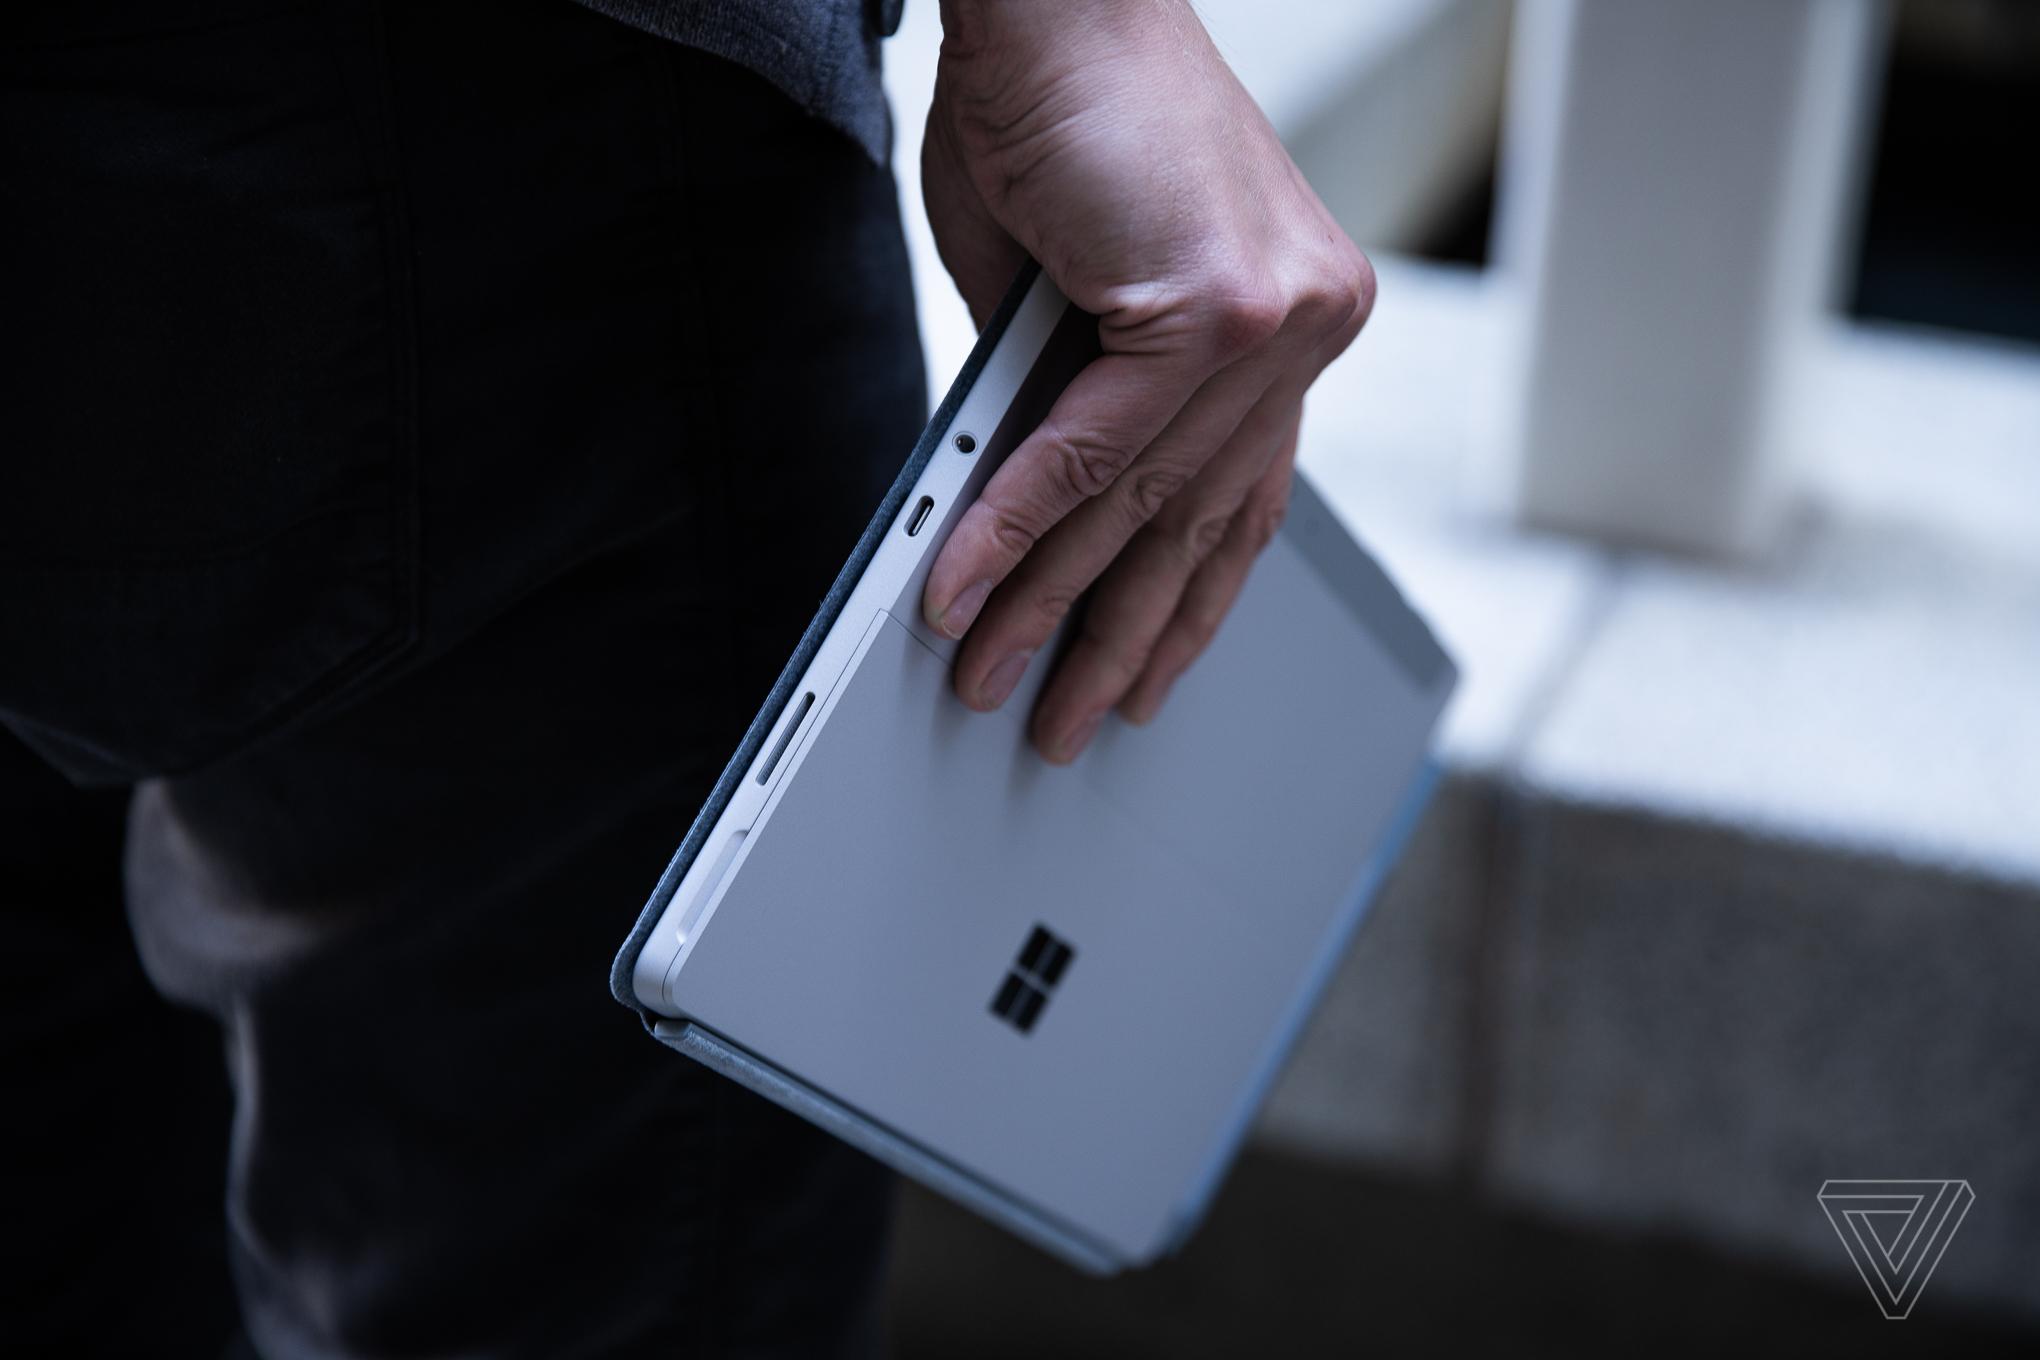 The Microsoft Surface Go 3